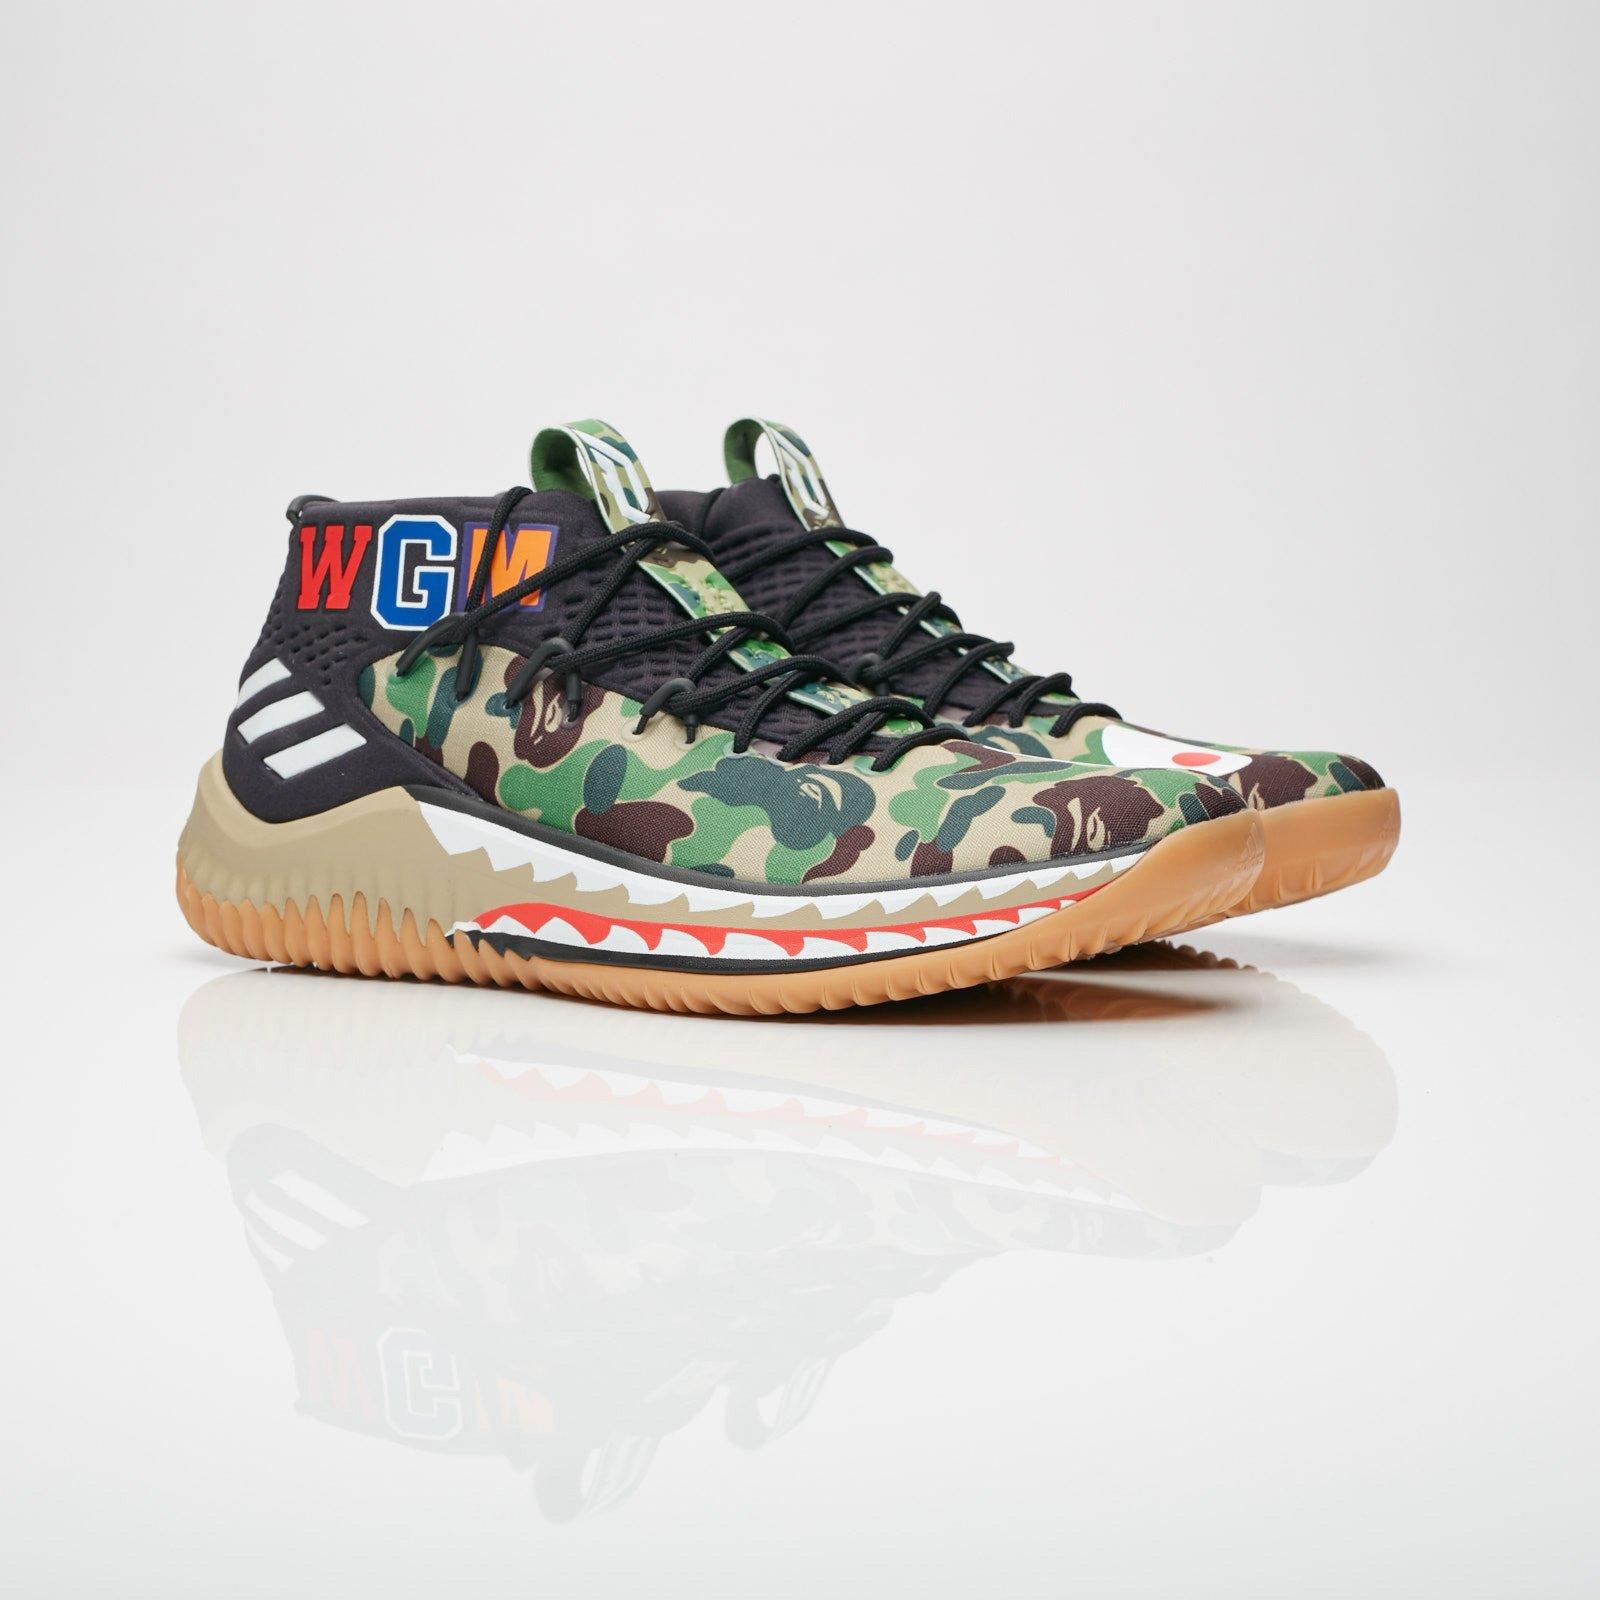 923fa70b503b adidas Dame 4 BAPE - Ap9974 - Sneakersnstuff